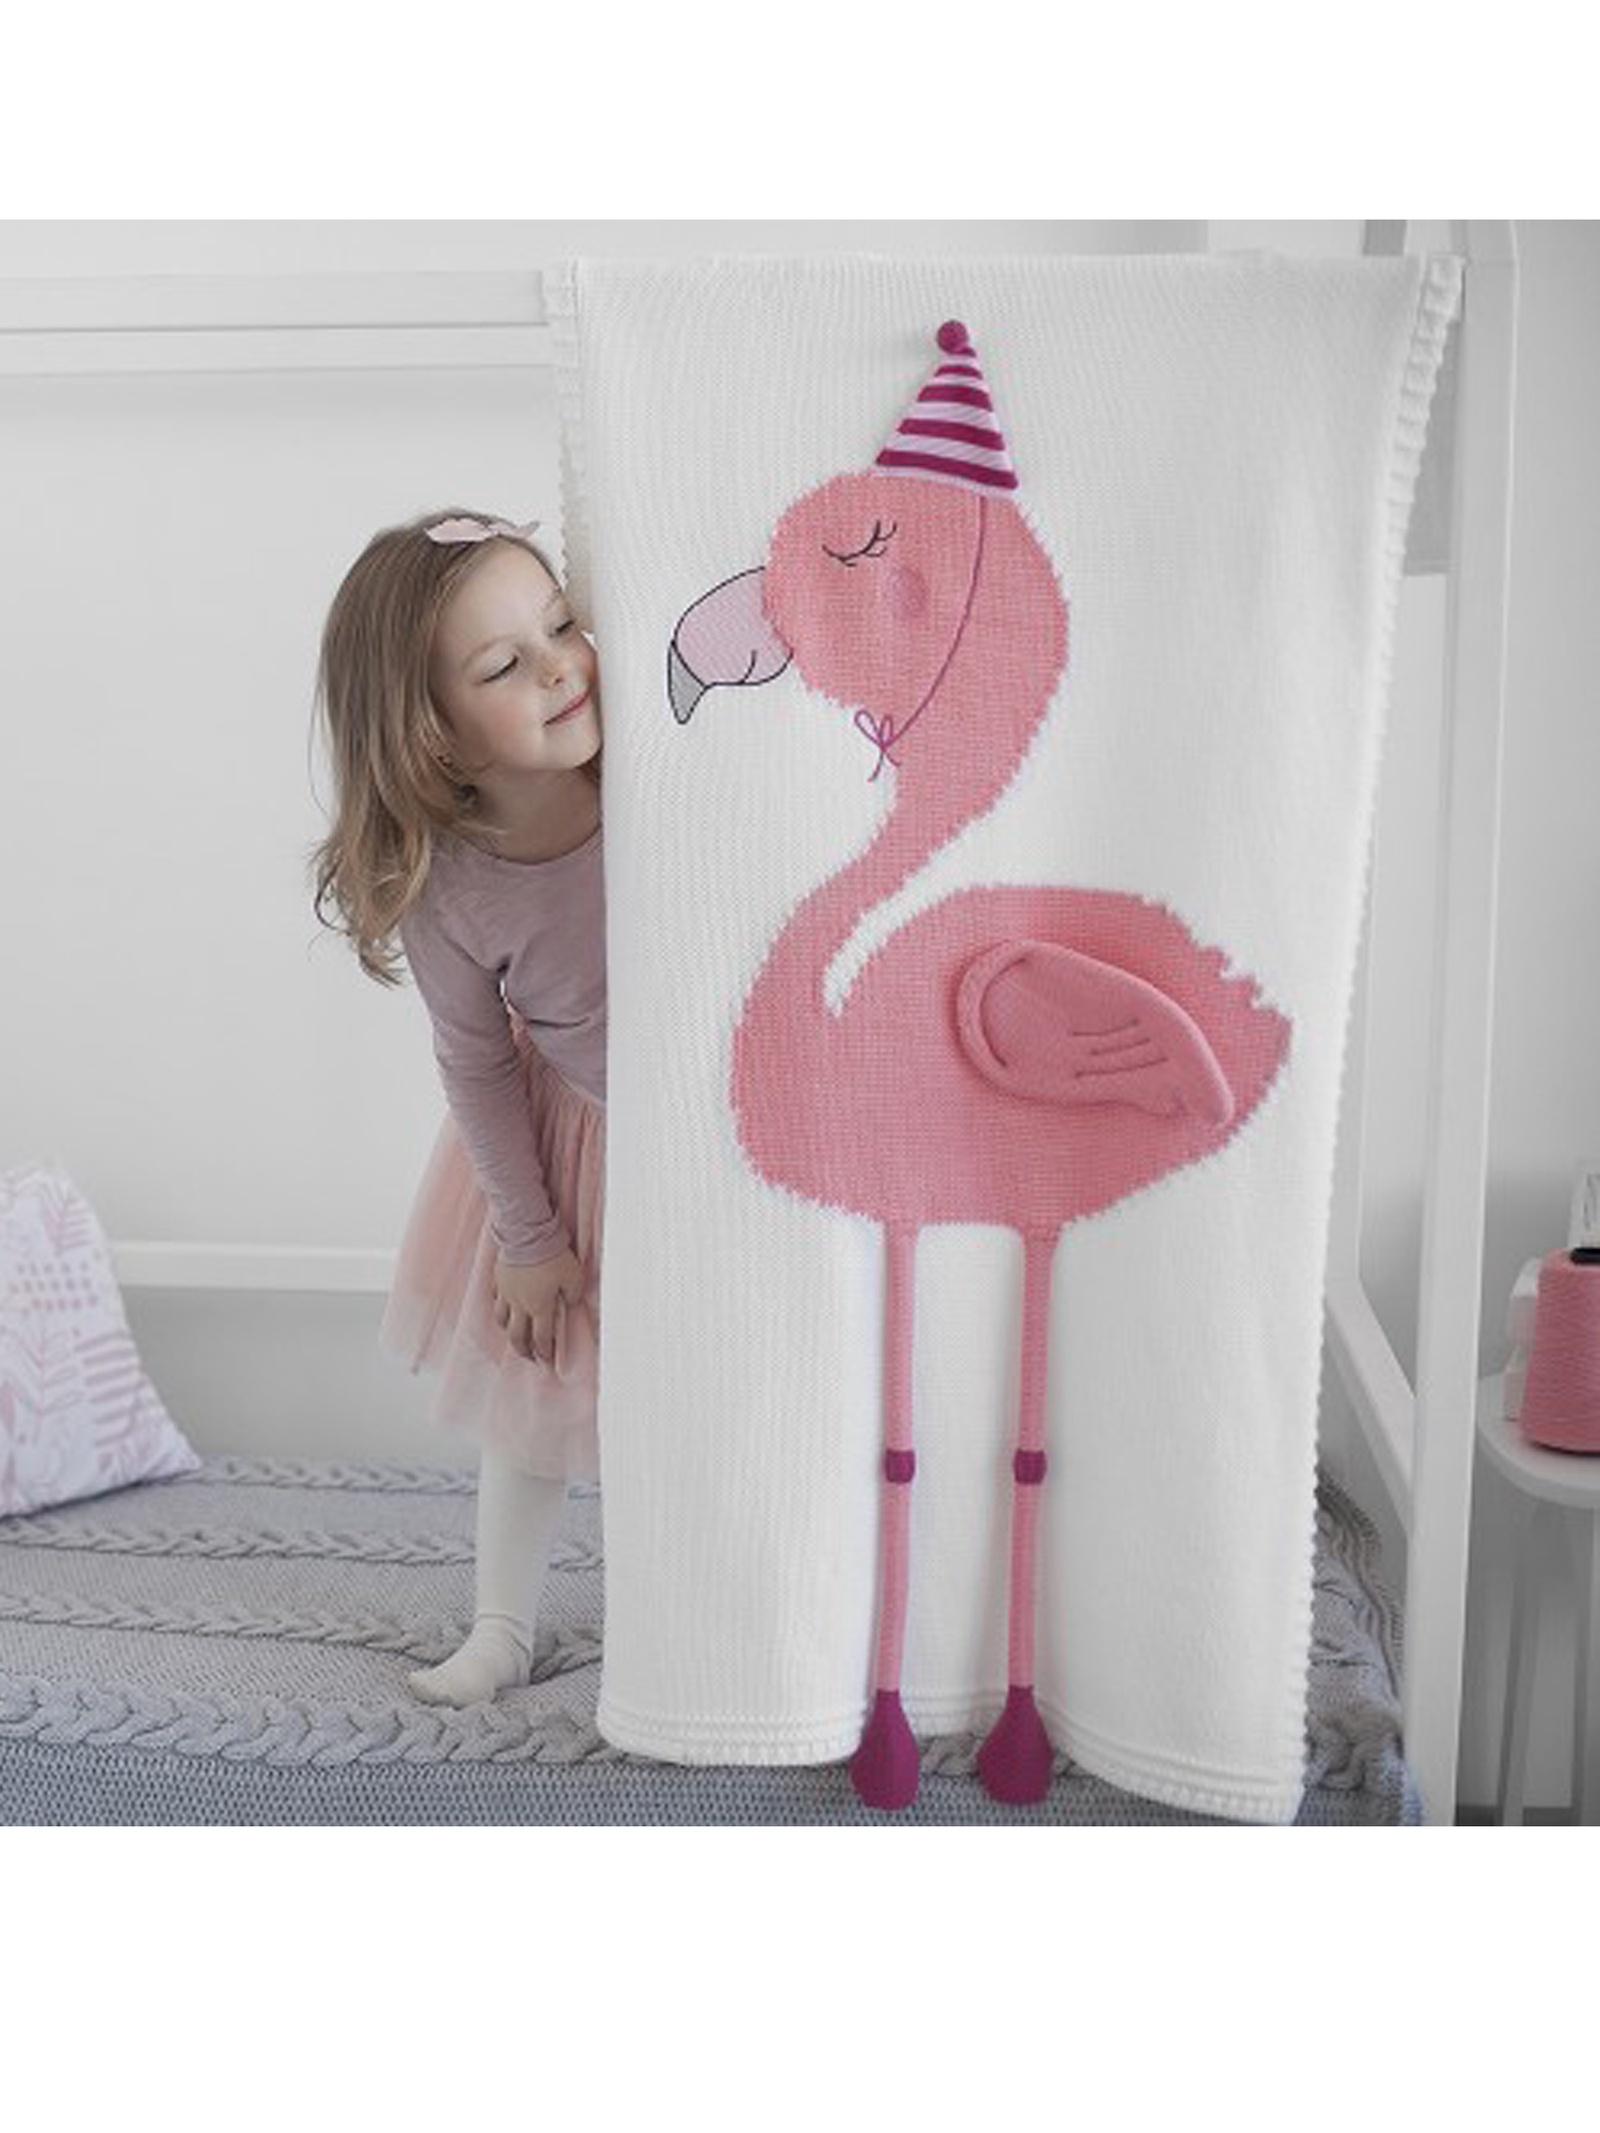 Детский плед Apero AP302-2WH, белый, розовый